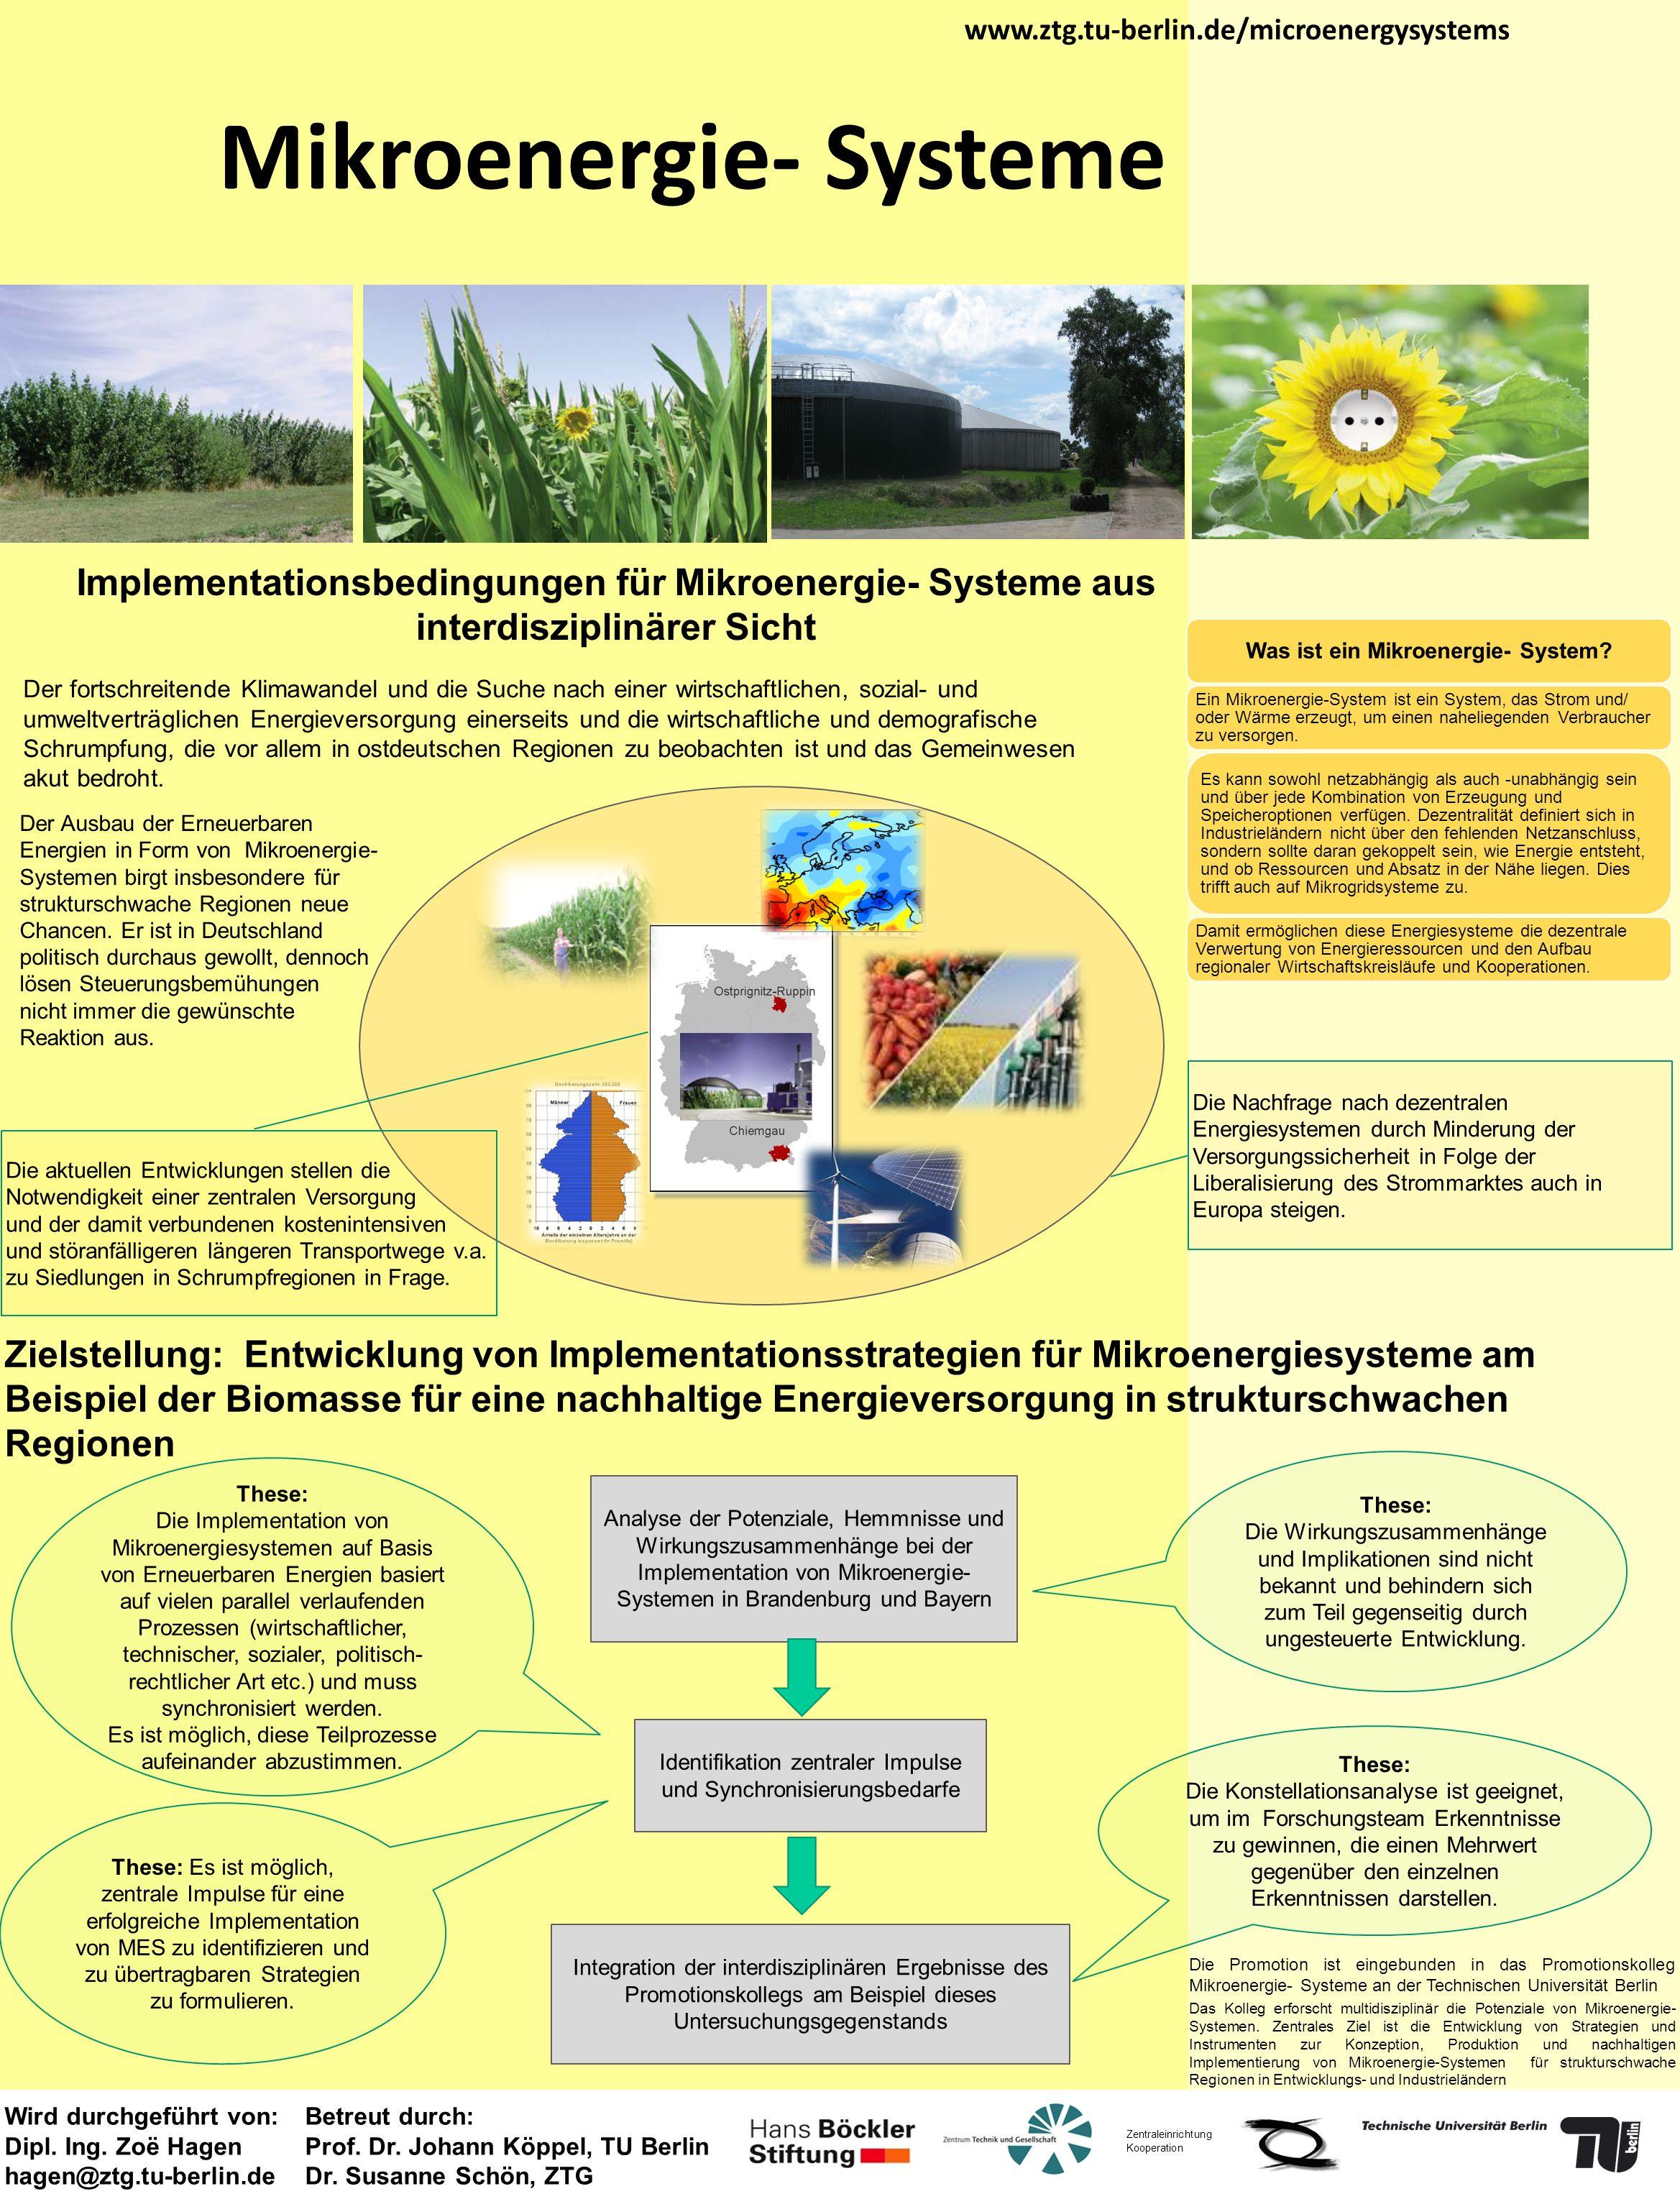 Mikroenergie- Systeme www.ztg.tu-berlin.de/microenergysystems Zentraleinrichtung Kooperation Was ist ein Mikroenergie- System? Ein Mikroenergie-System